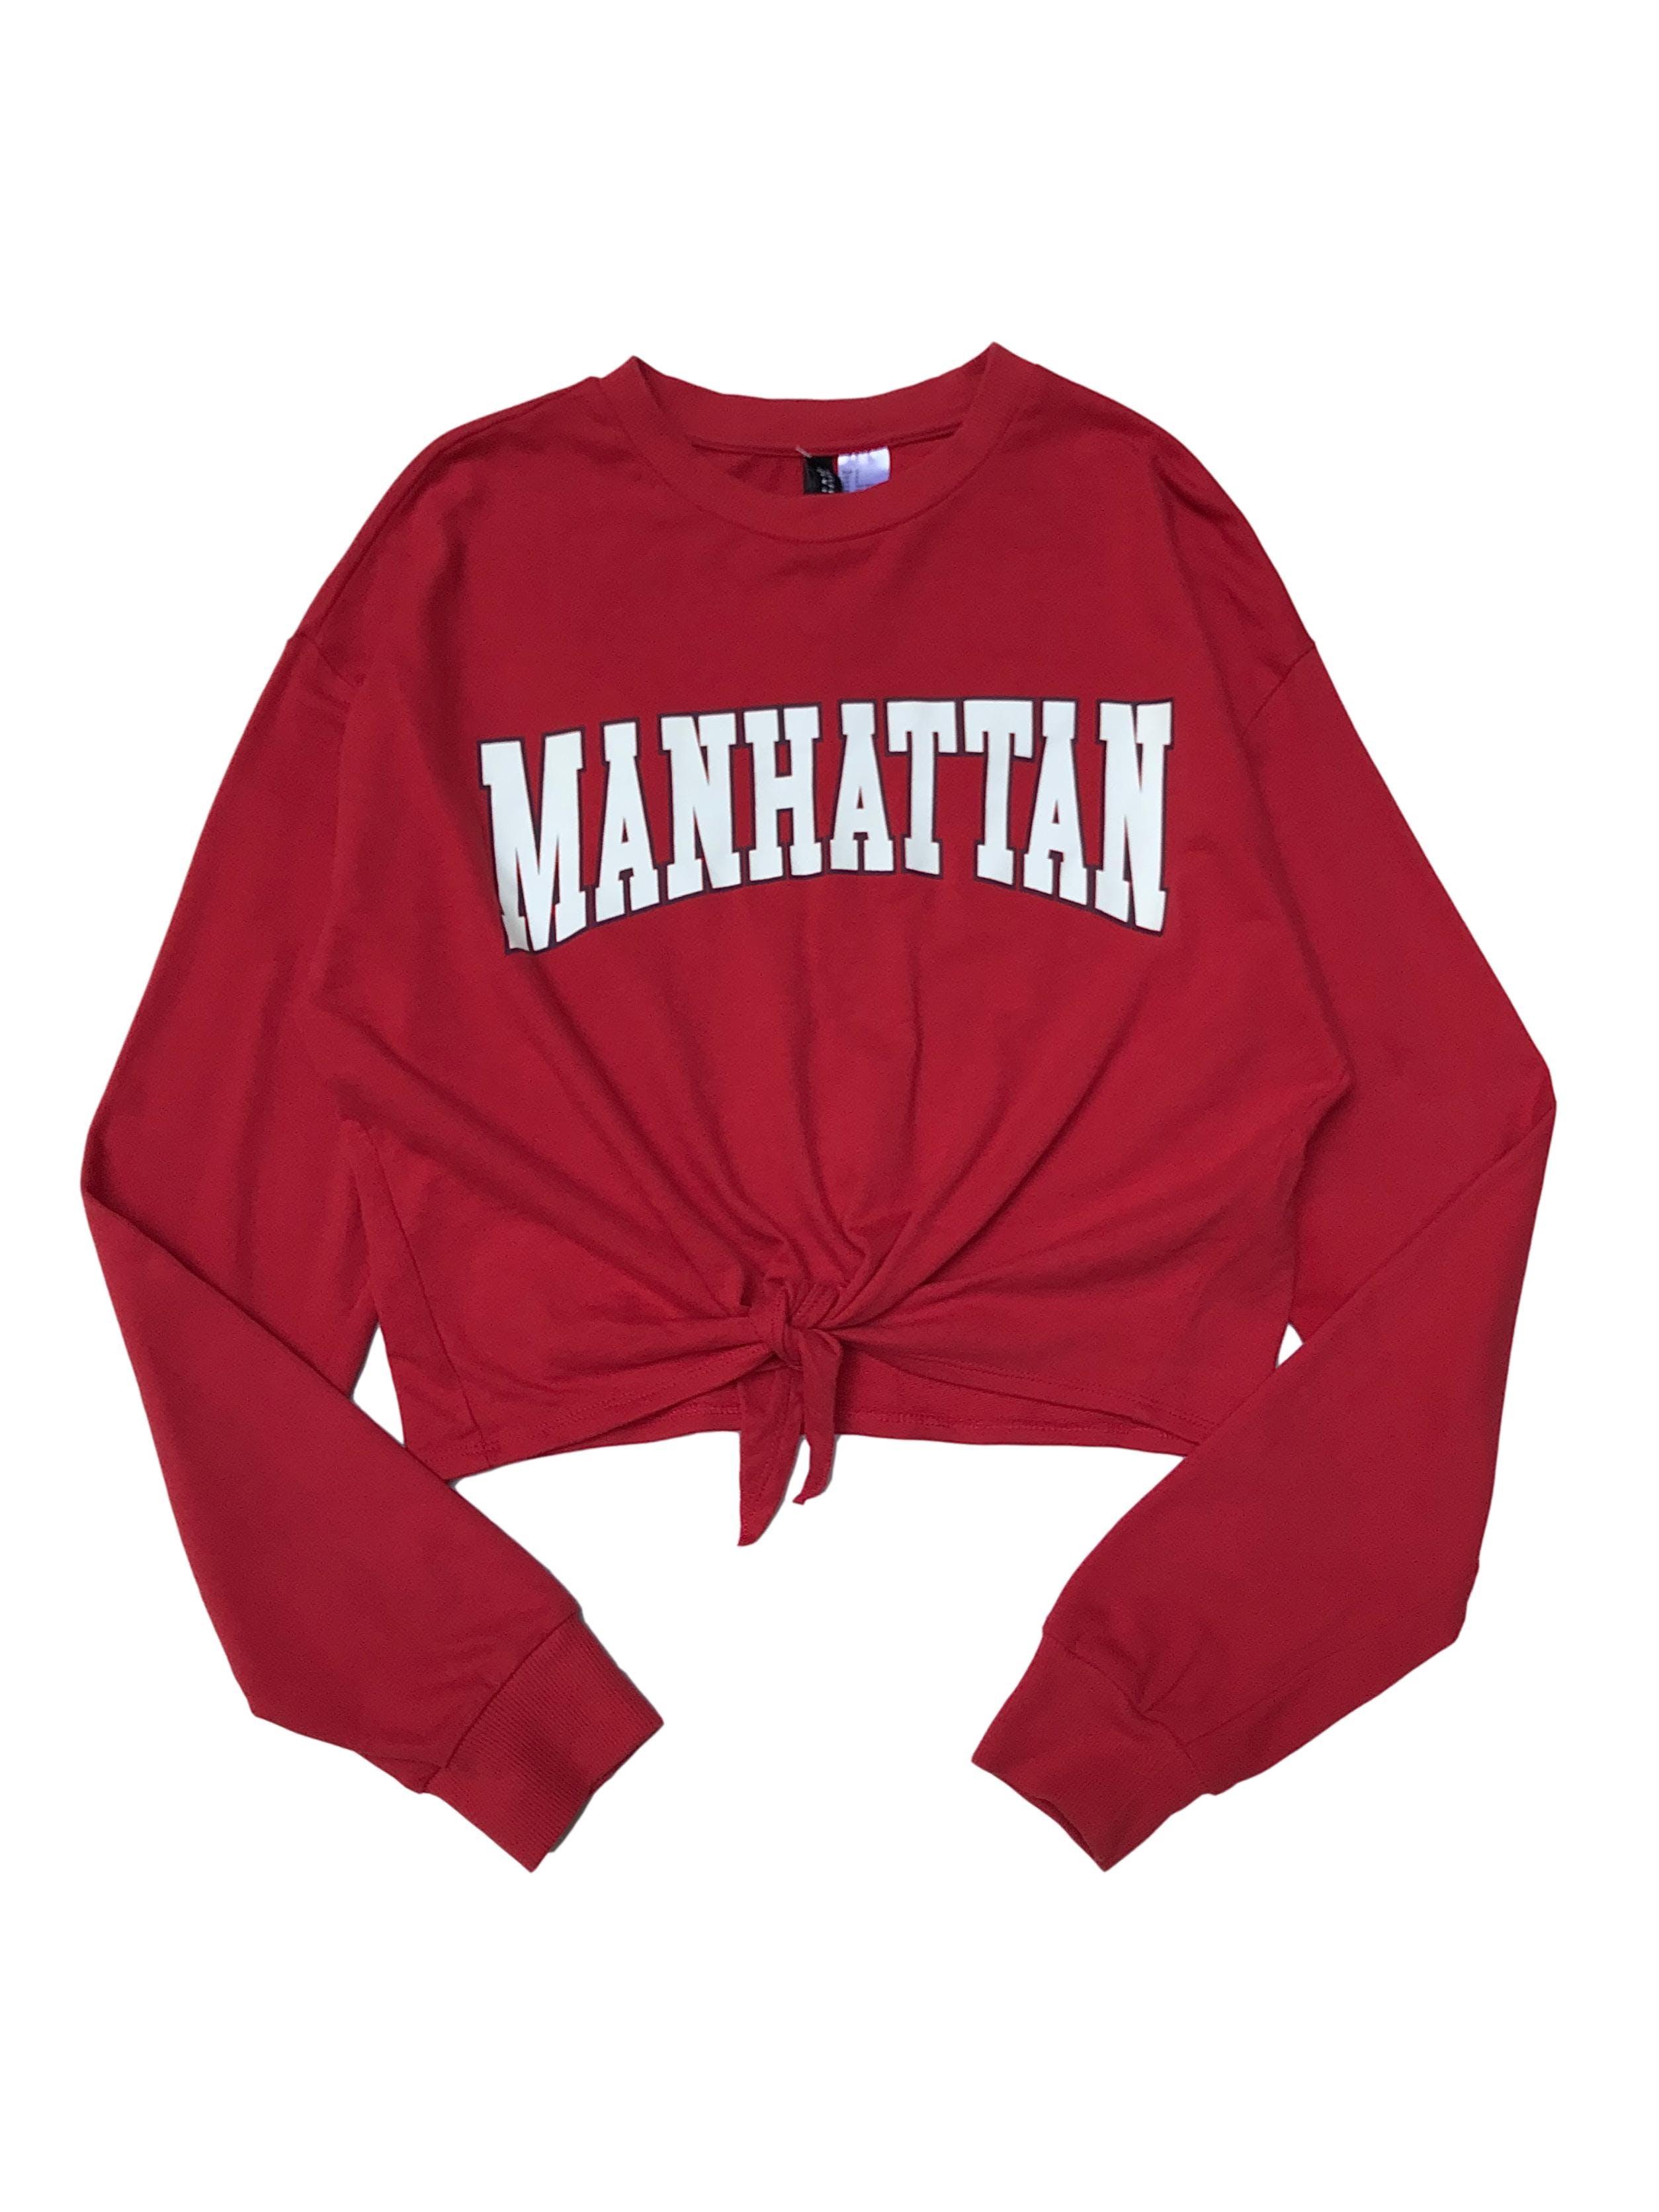 Polera H&M oversize corta, delgada de french terry (no afranelada) con print Manhattan. Largo 45cm